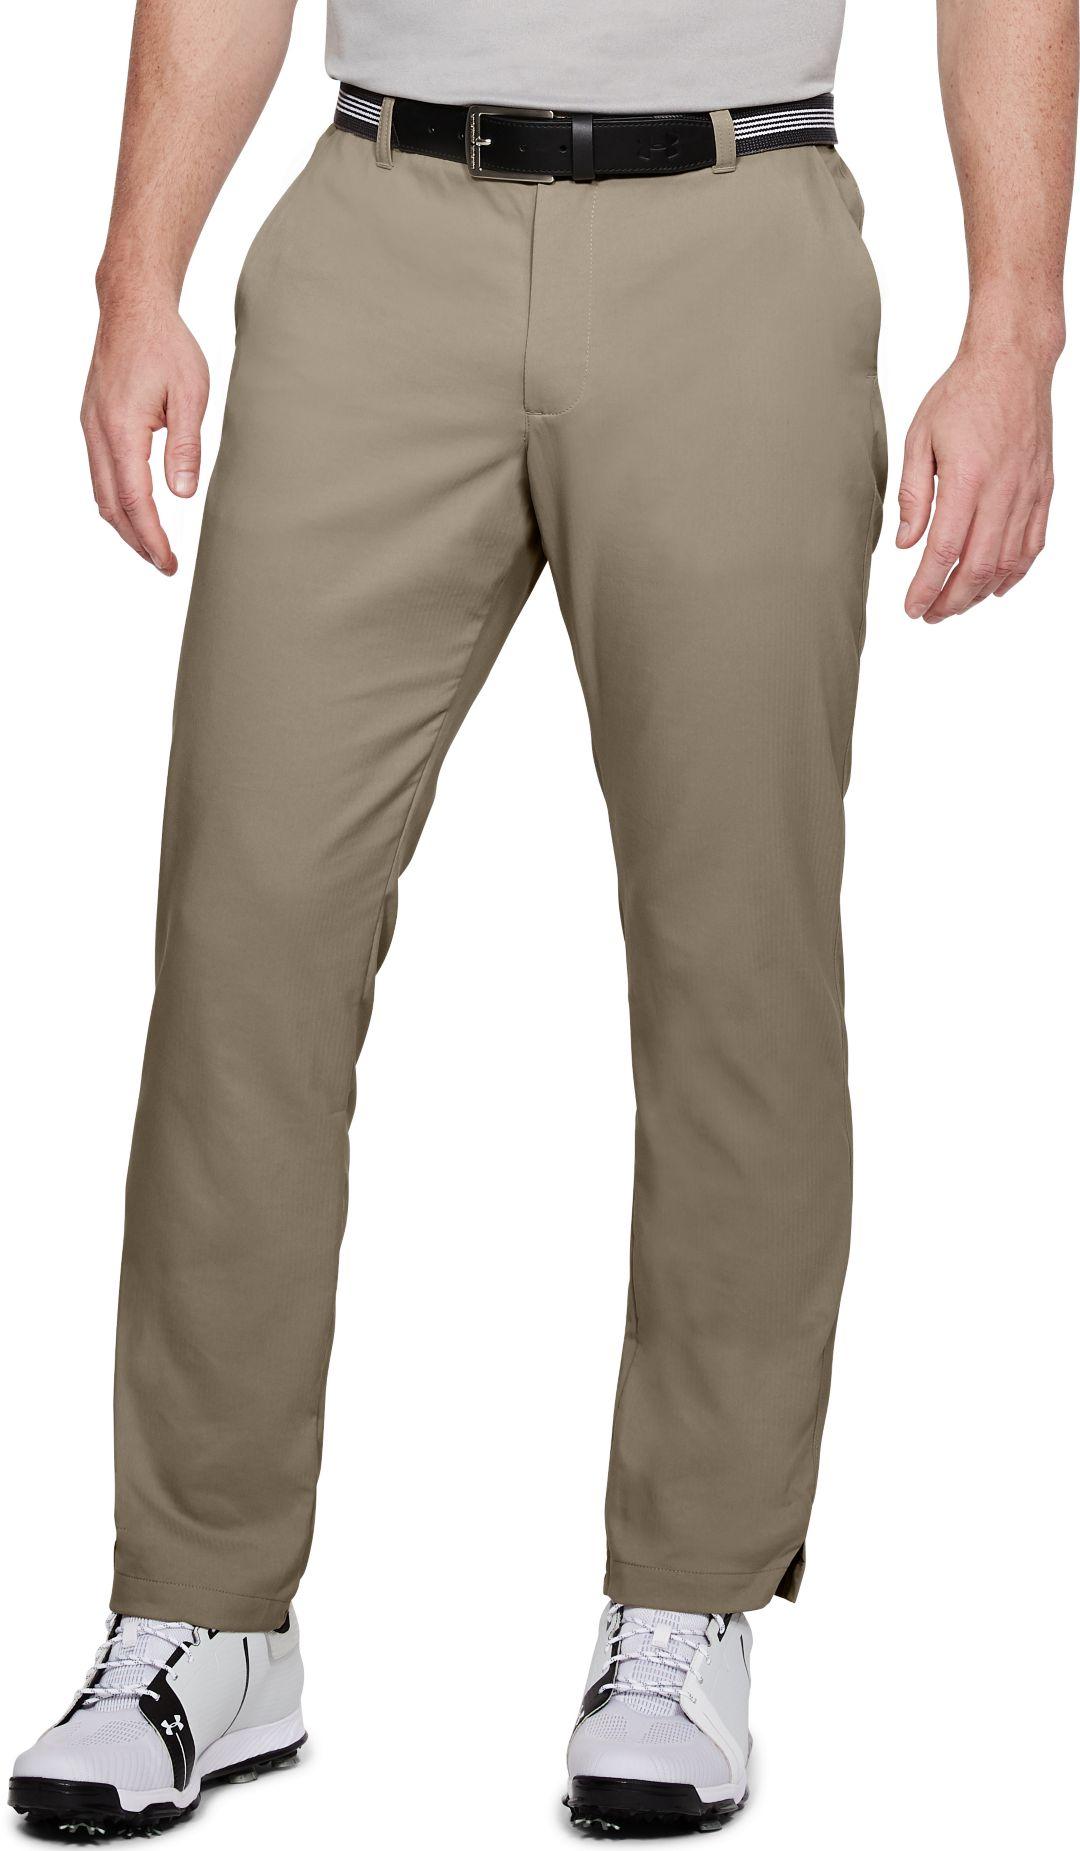 b9edab546 Under Armour Men's Showdown Straight Golf Pants | DICK'S Sporting Goods